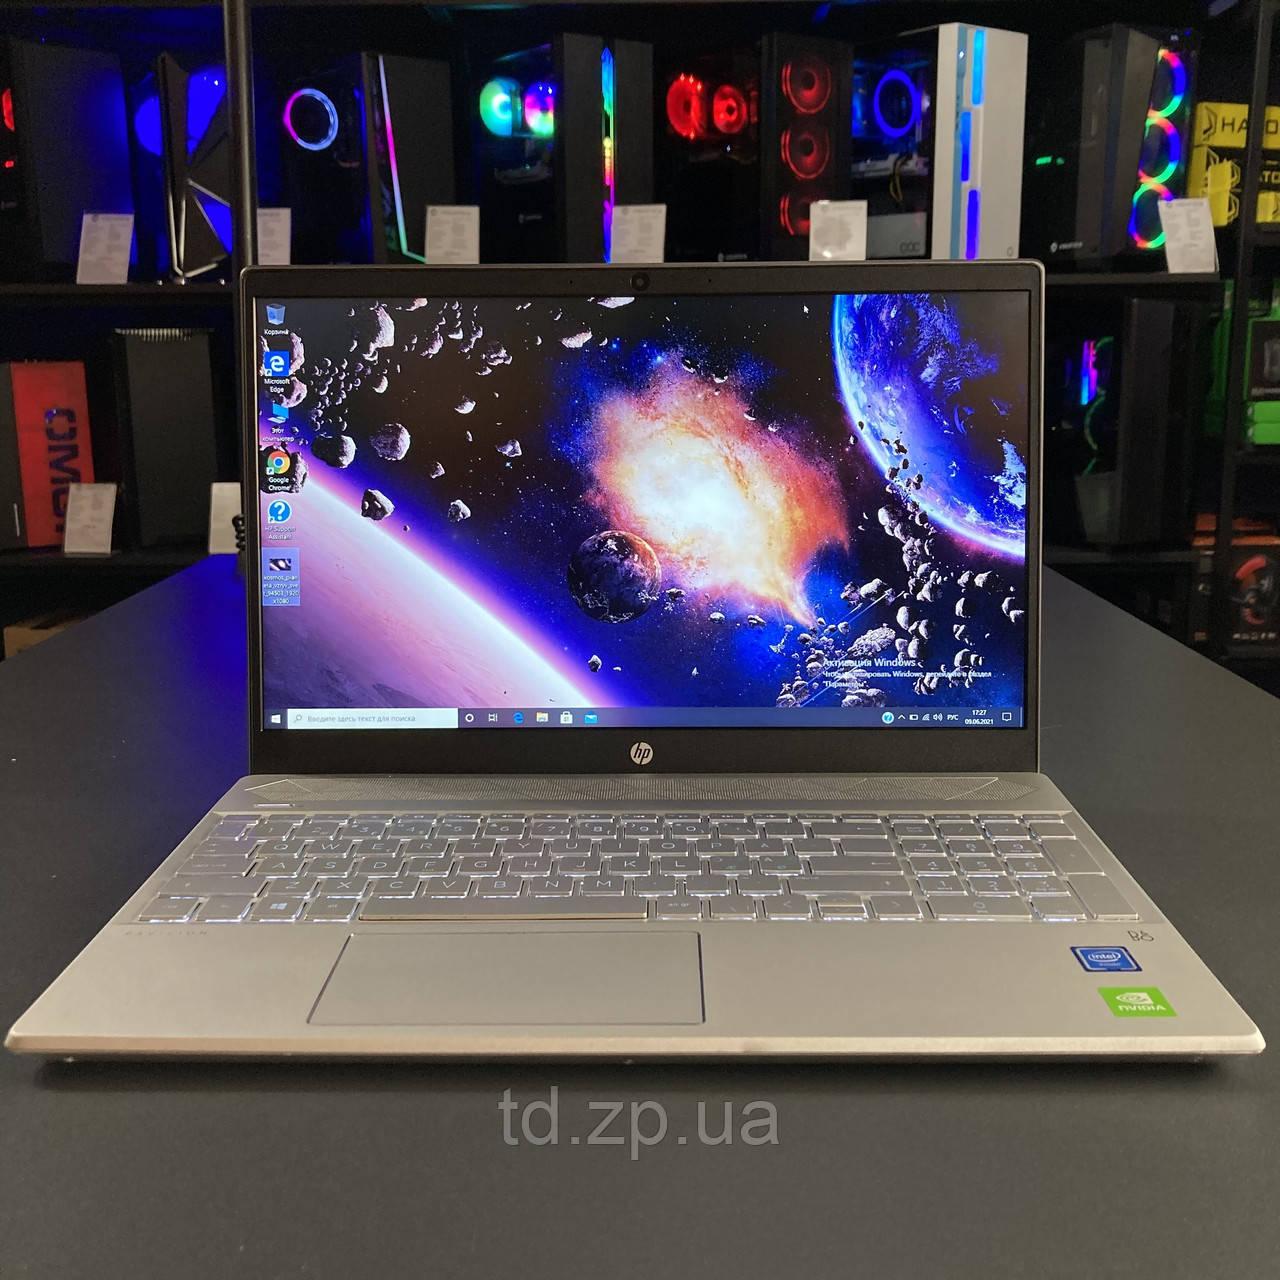 "Ноутбук HP Pavilion LapTop 15-cs 3101 15.6"" Intel Core i5-1035g4/8Gb DDR4/512Gb SSD"